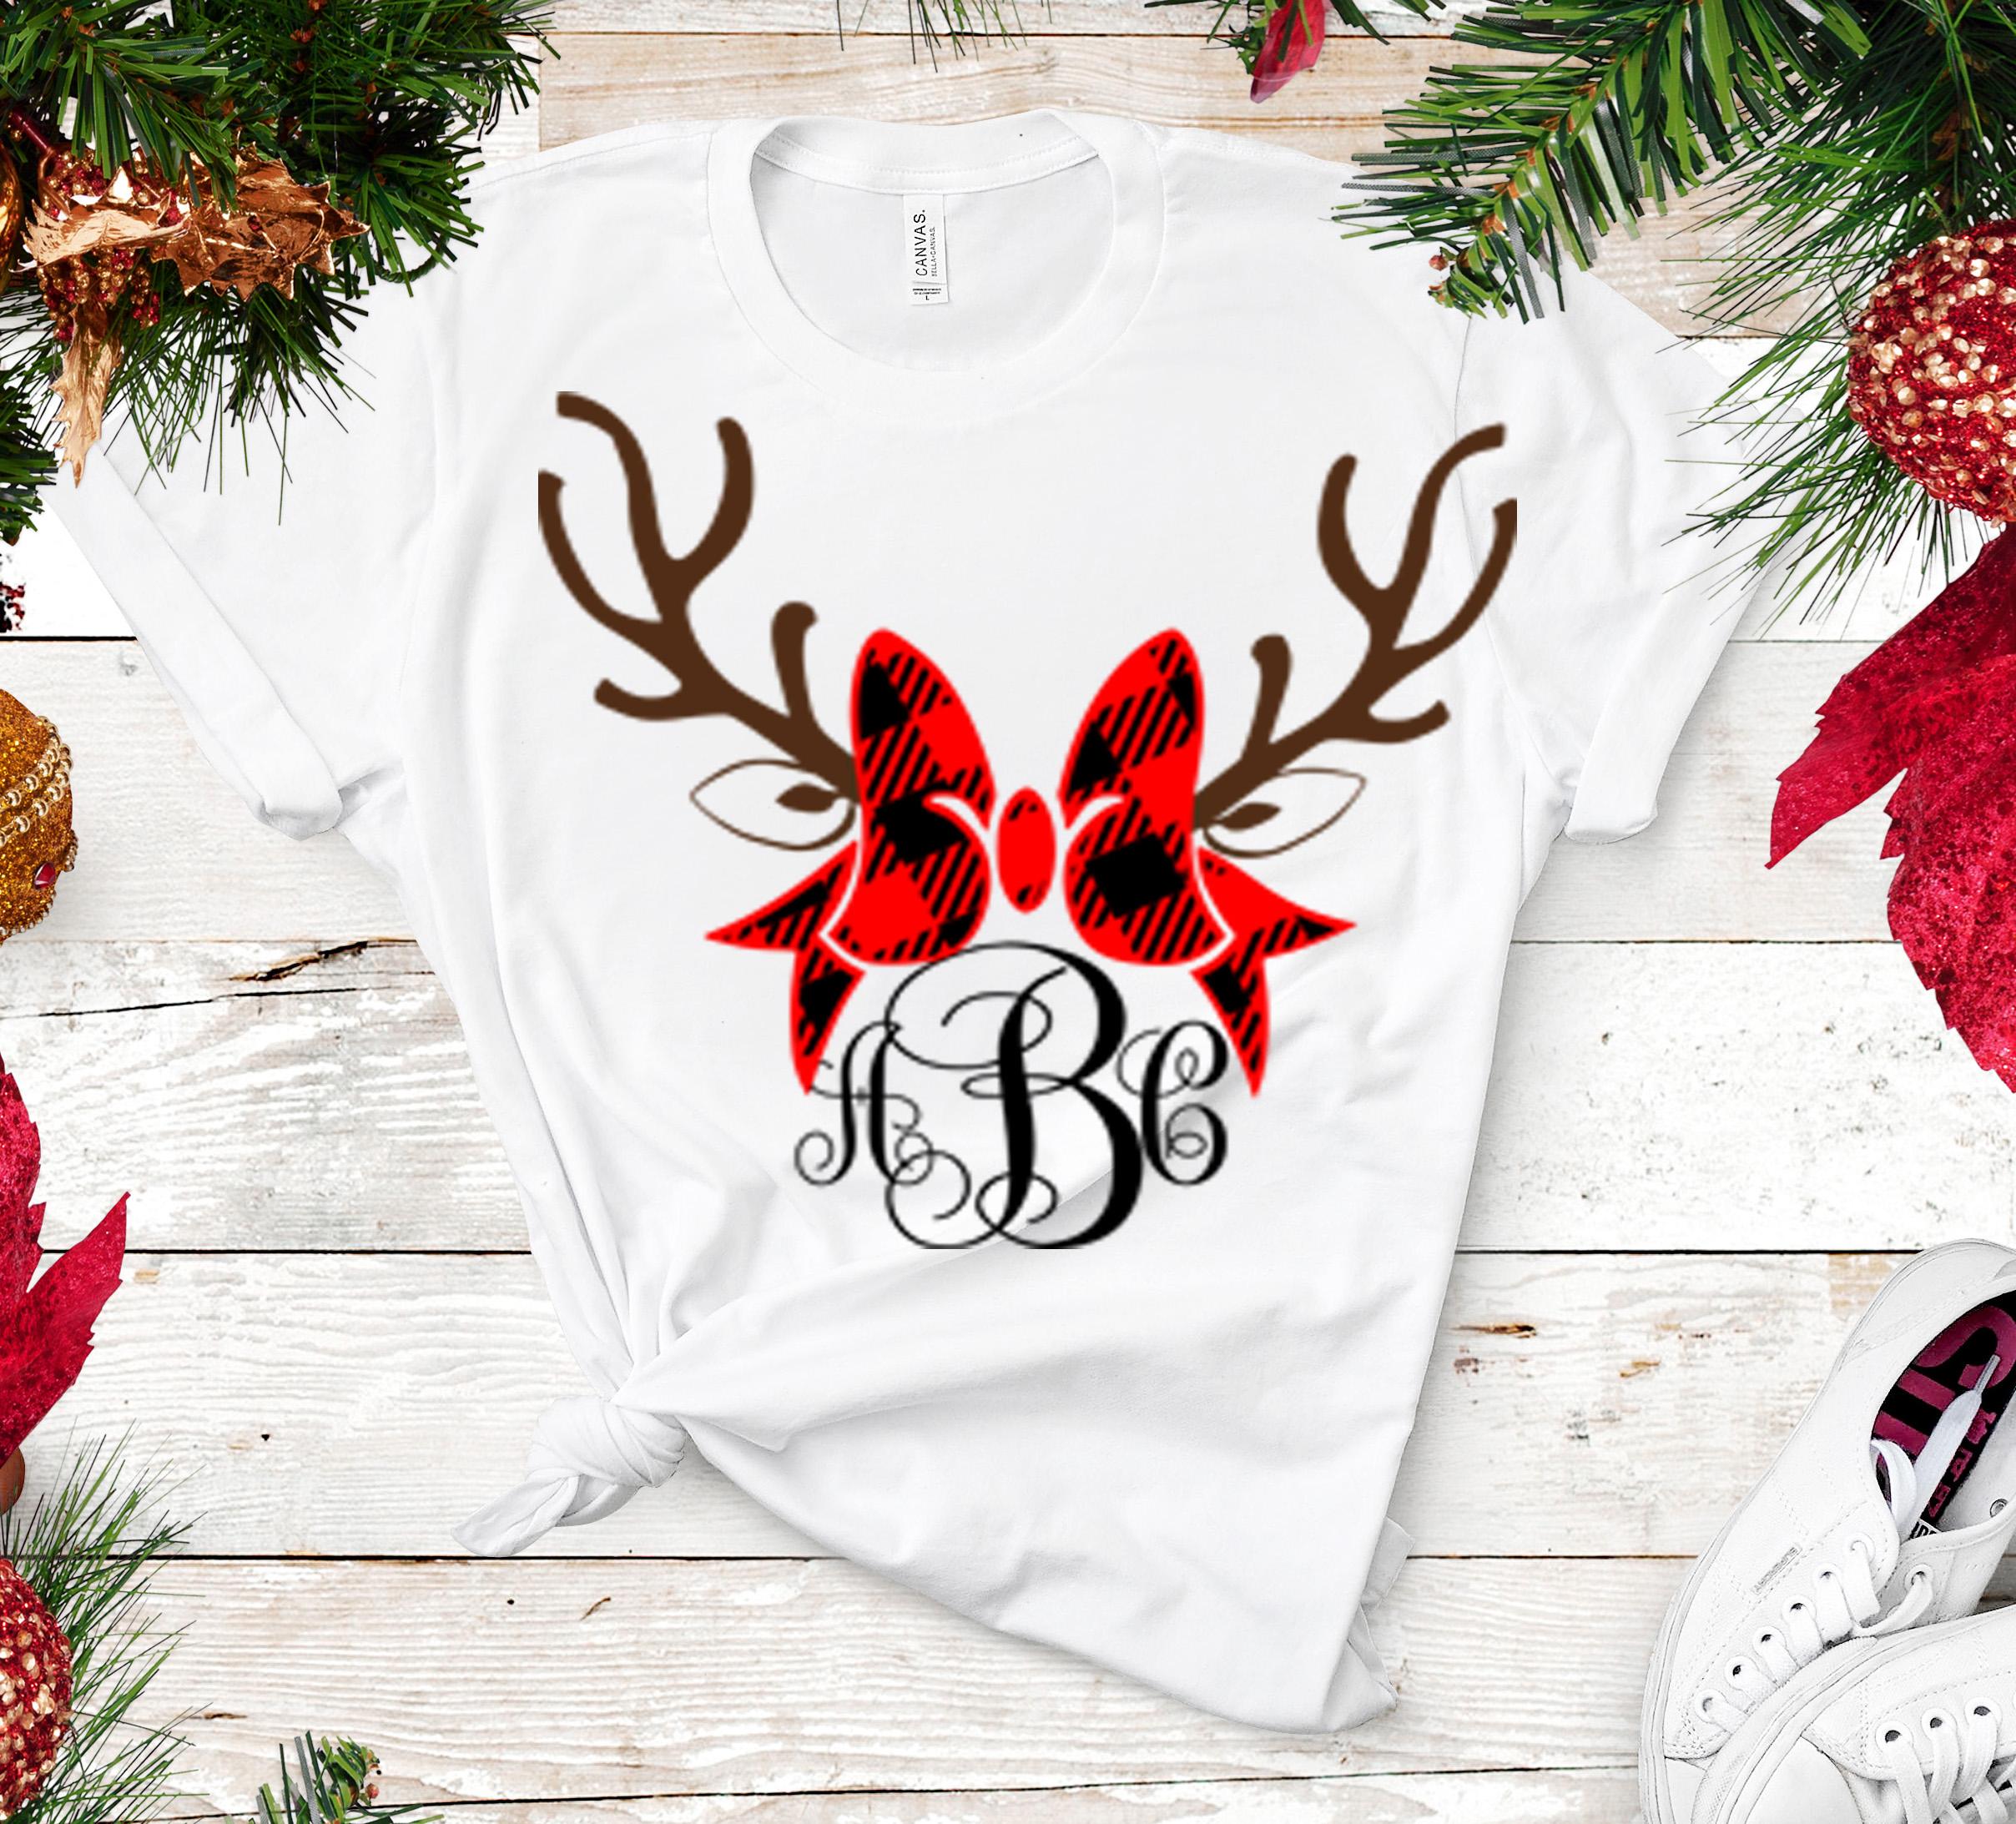 Plaid Antlers Bow monogram frame Deer SVG - Christmas SVG example image 2